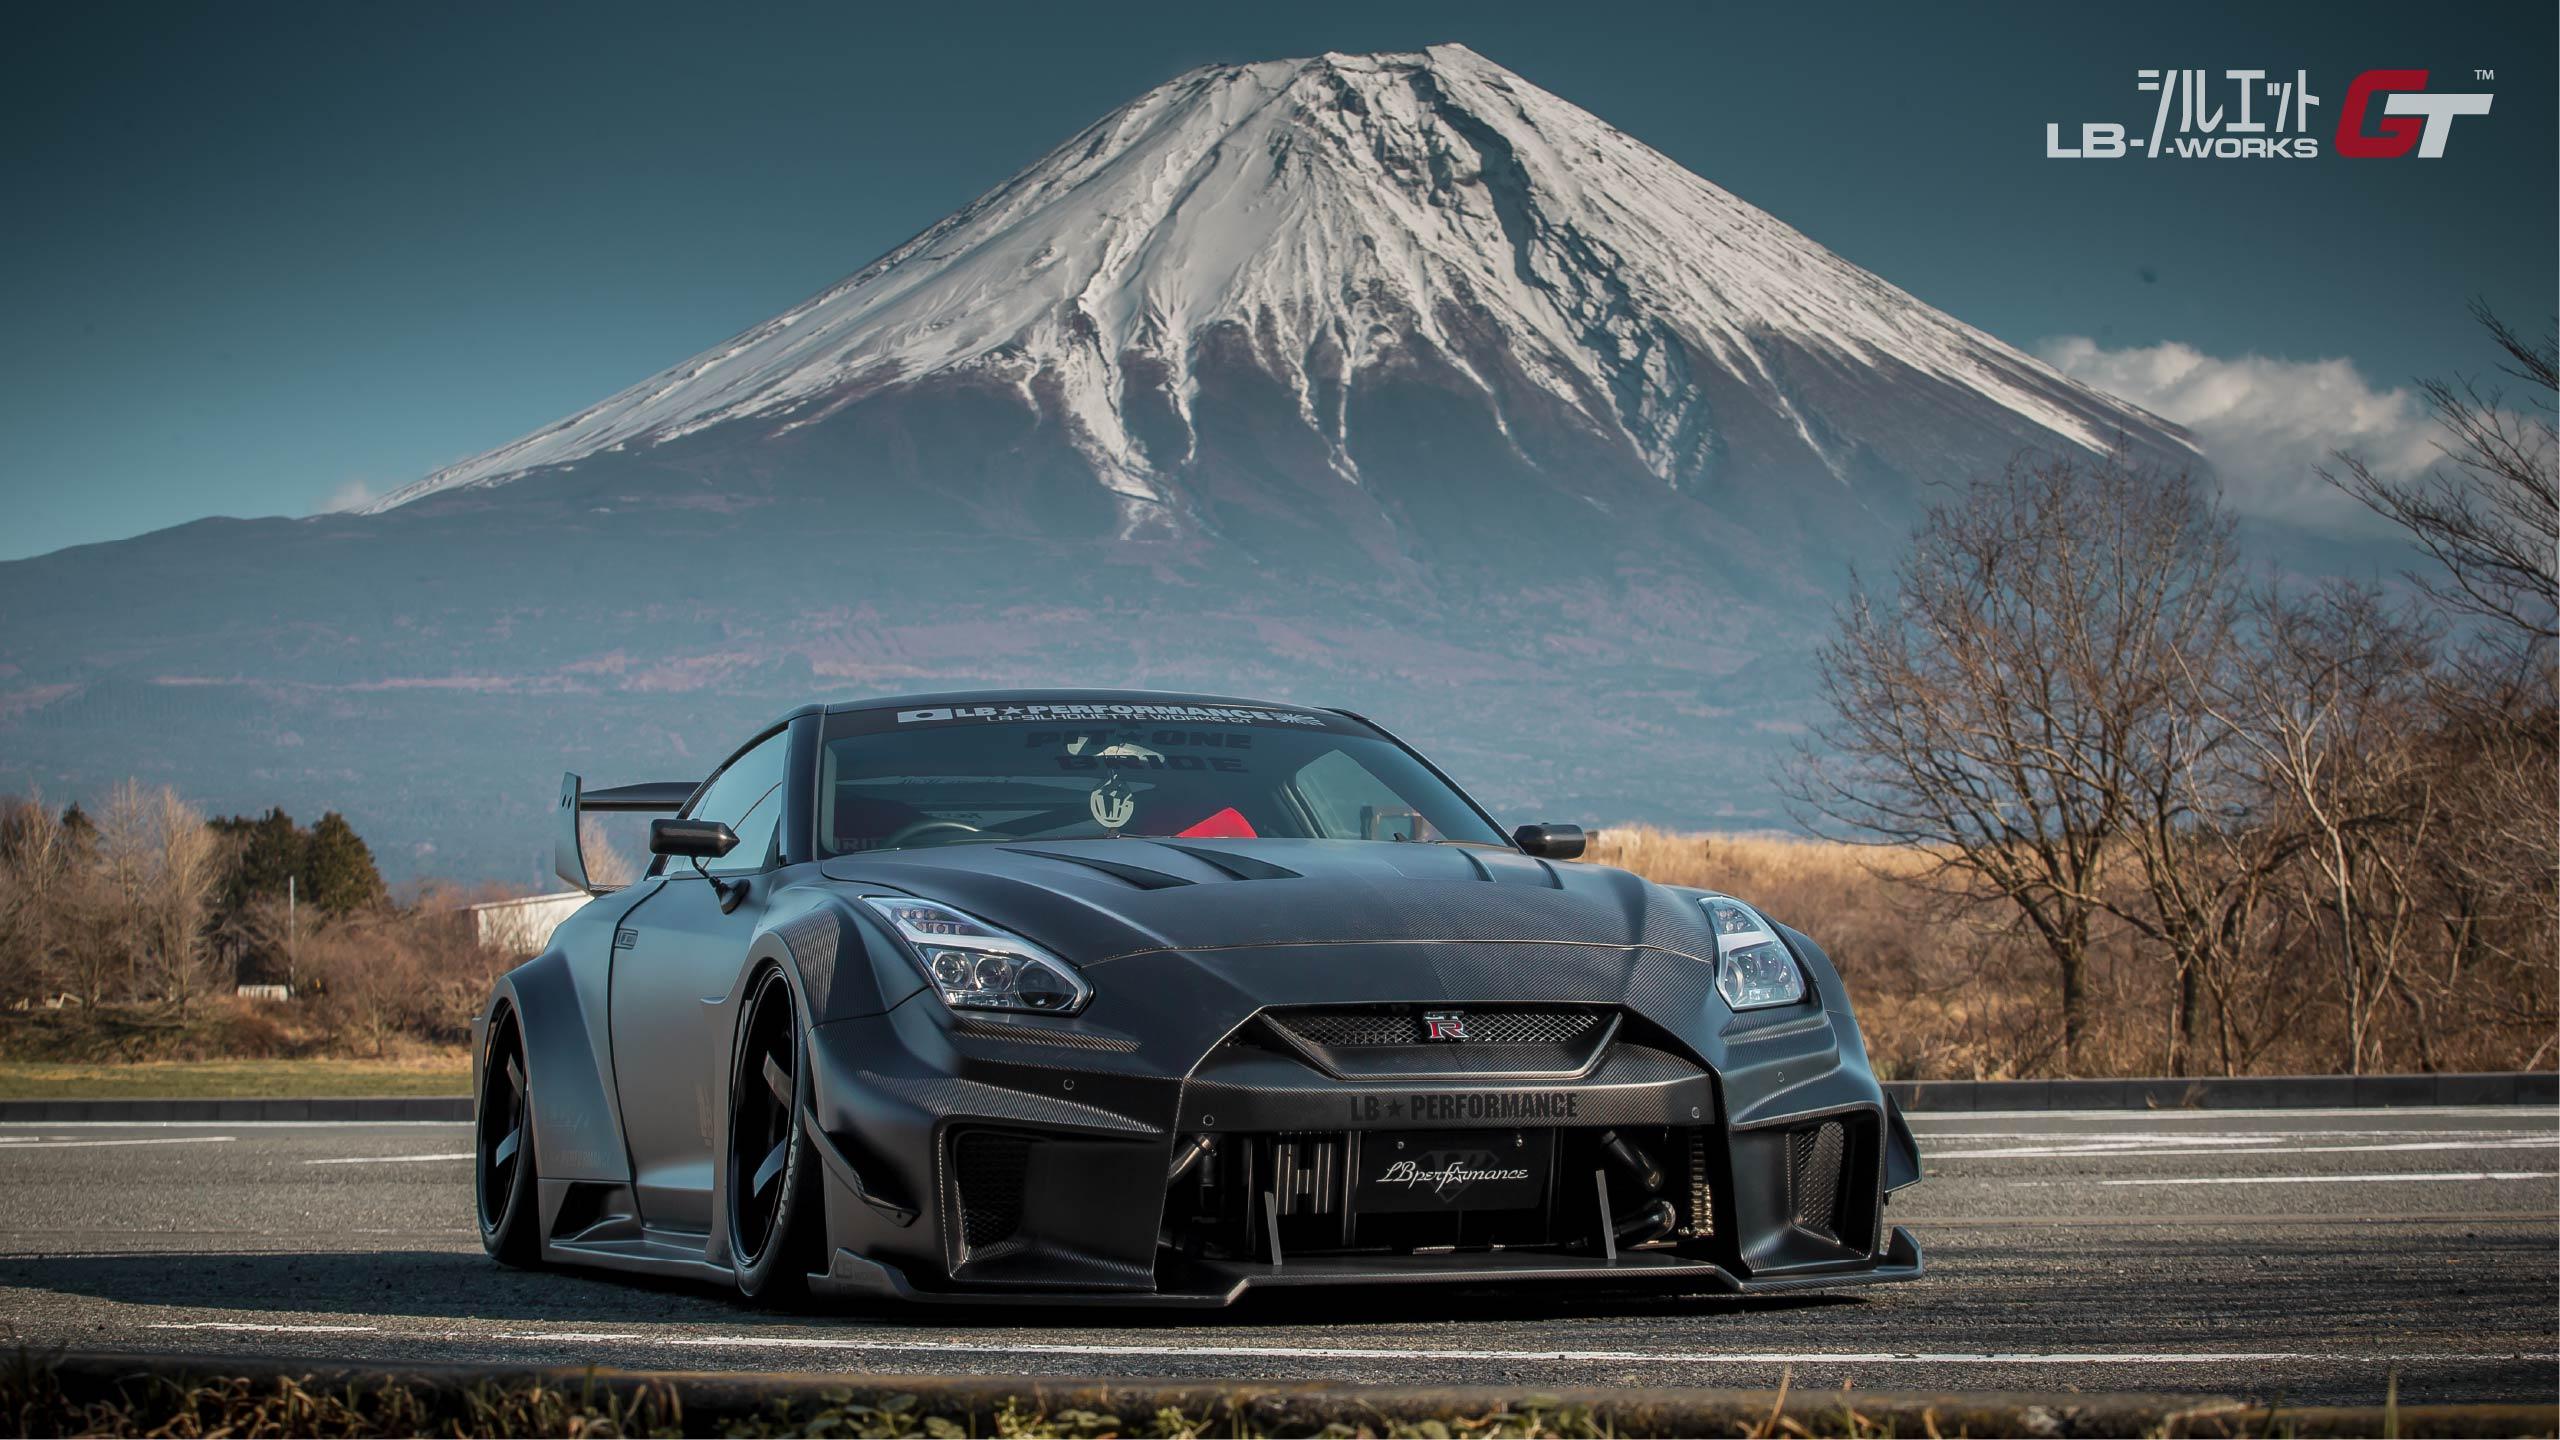 Liberty Walk Reveals Super Wide Nissan Gt R Silhouette Body Kit Autoevolution